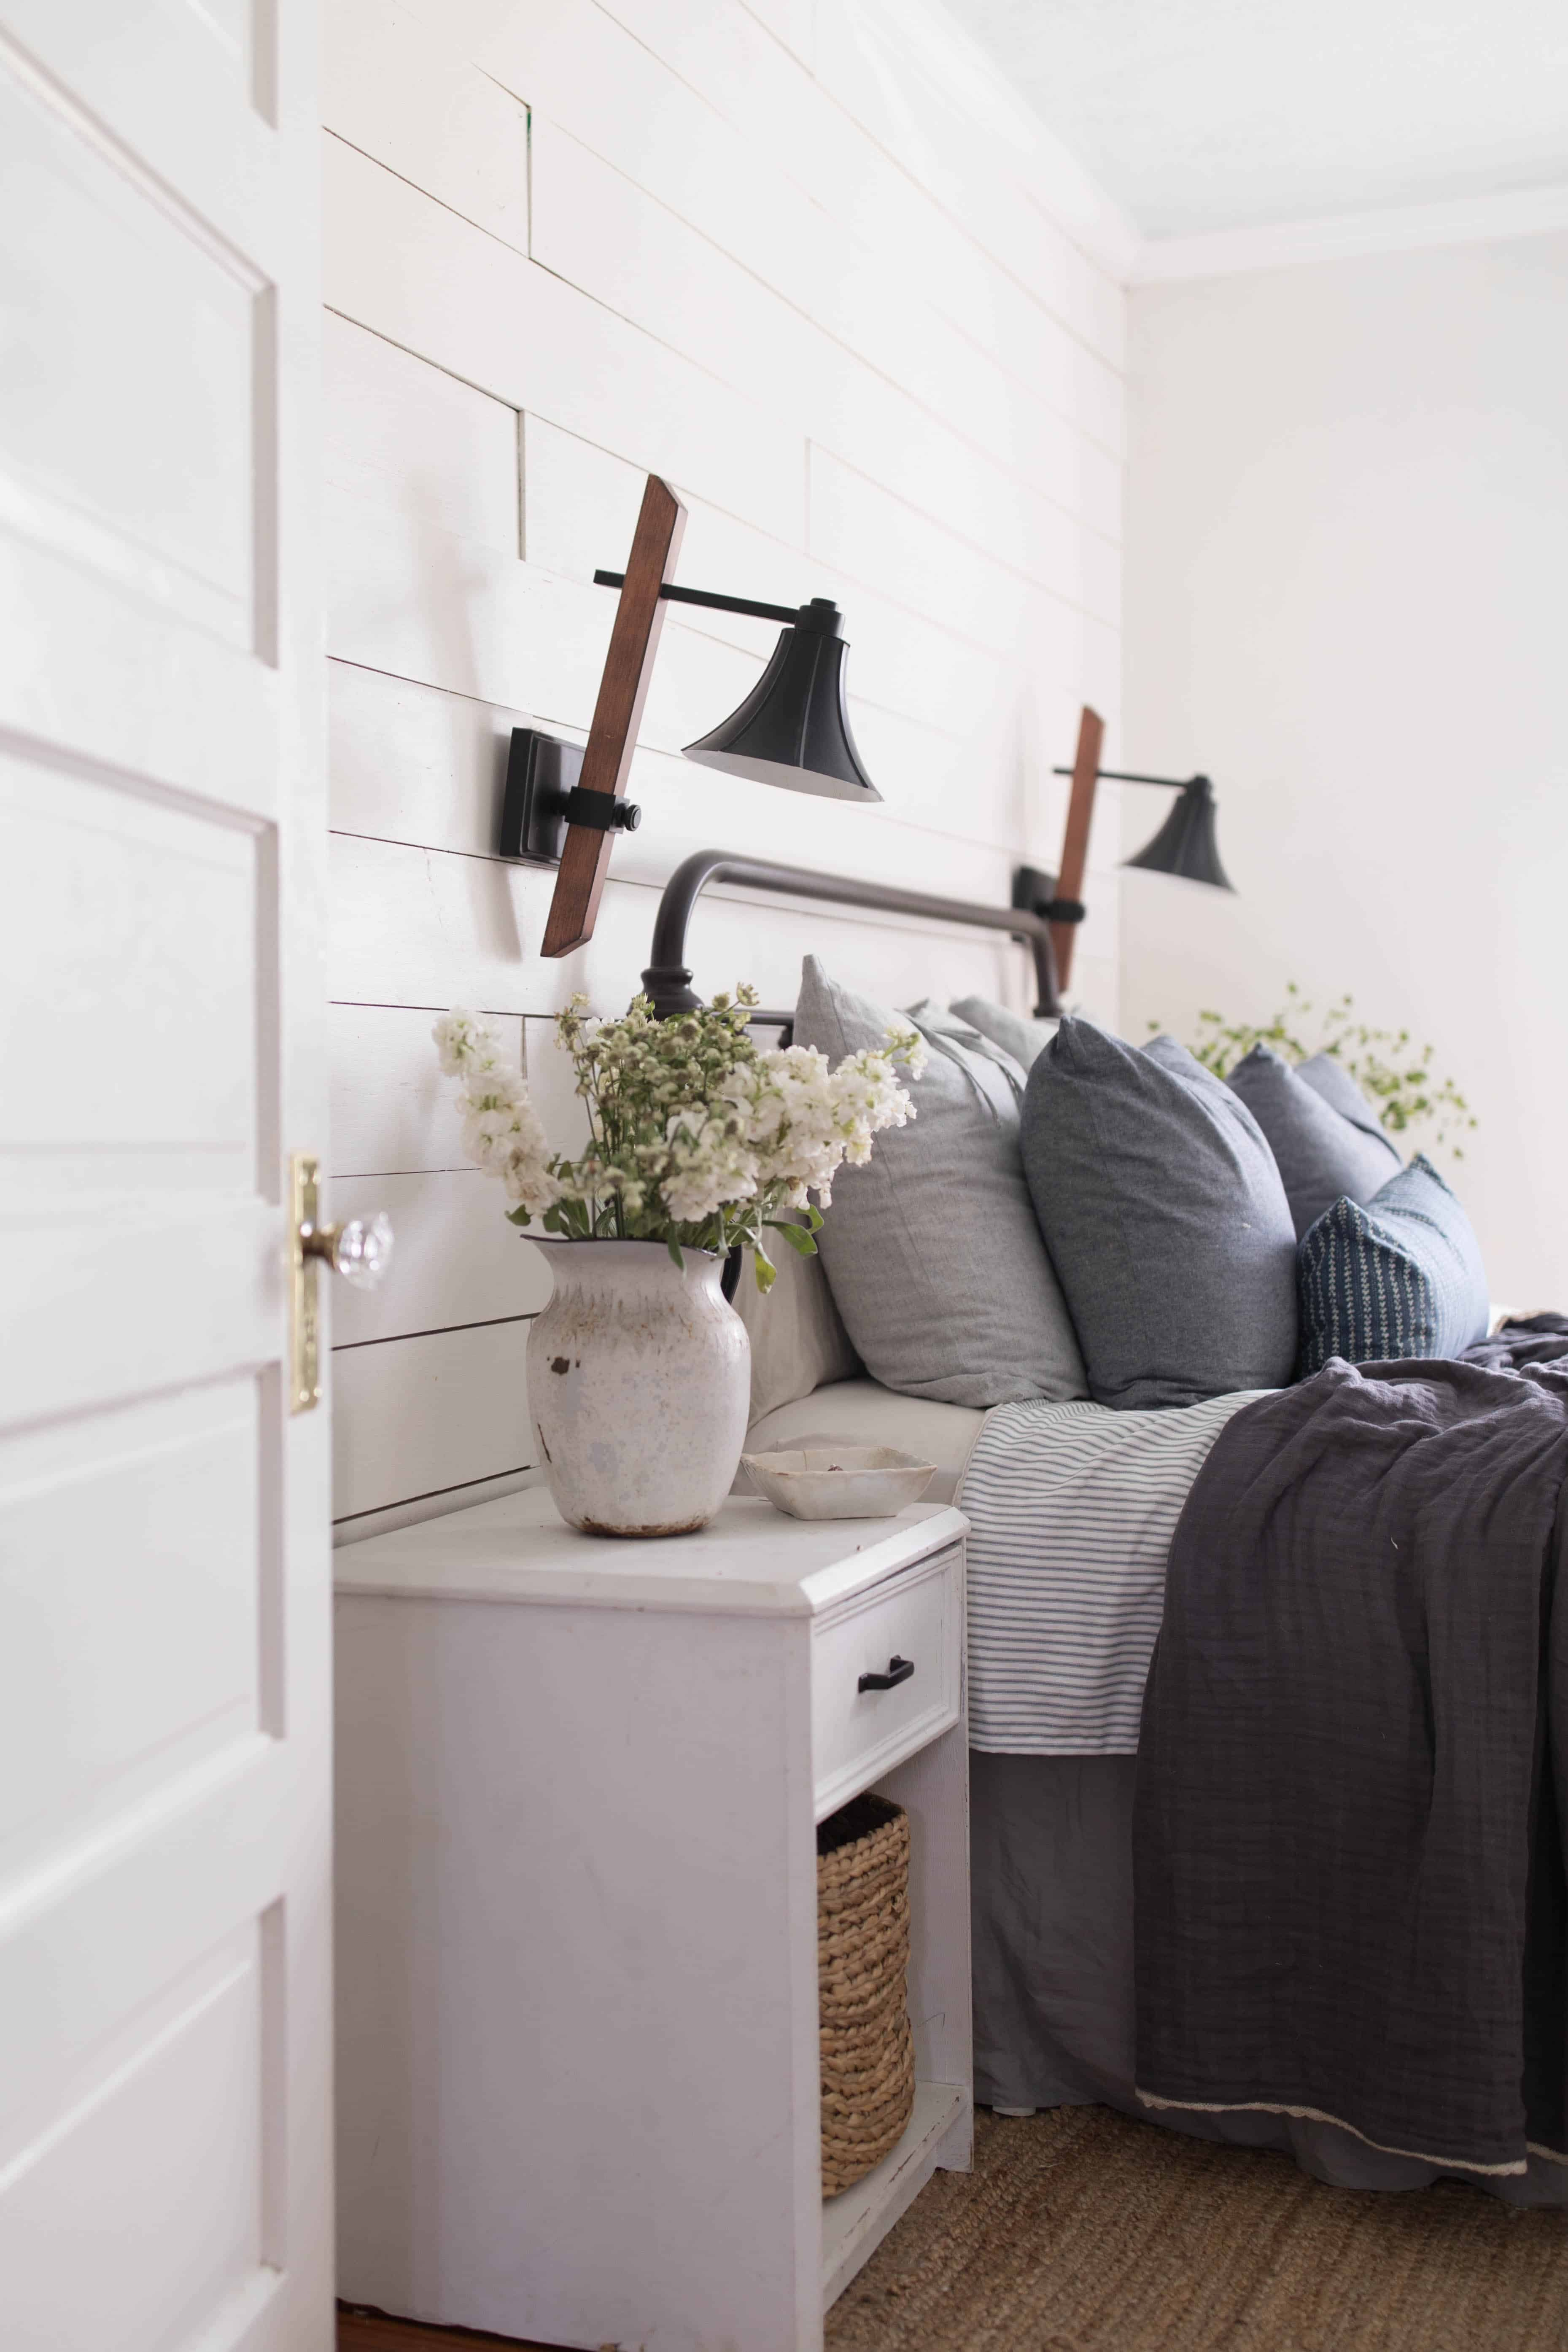 Summer bedroom farmhouse decor farmhouse on boone - How to design a small bedroom ...